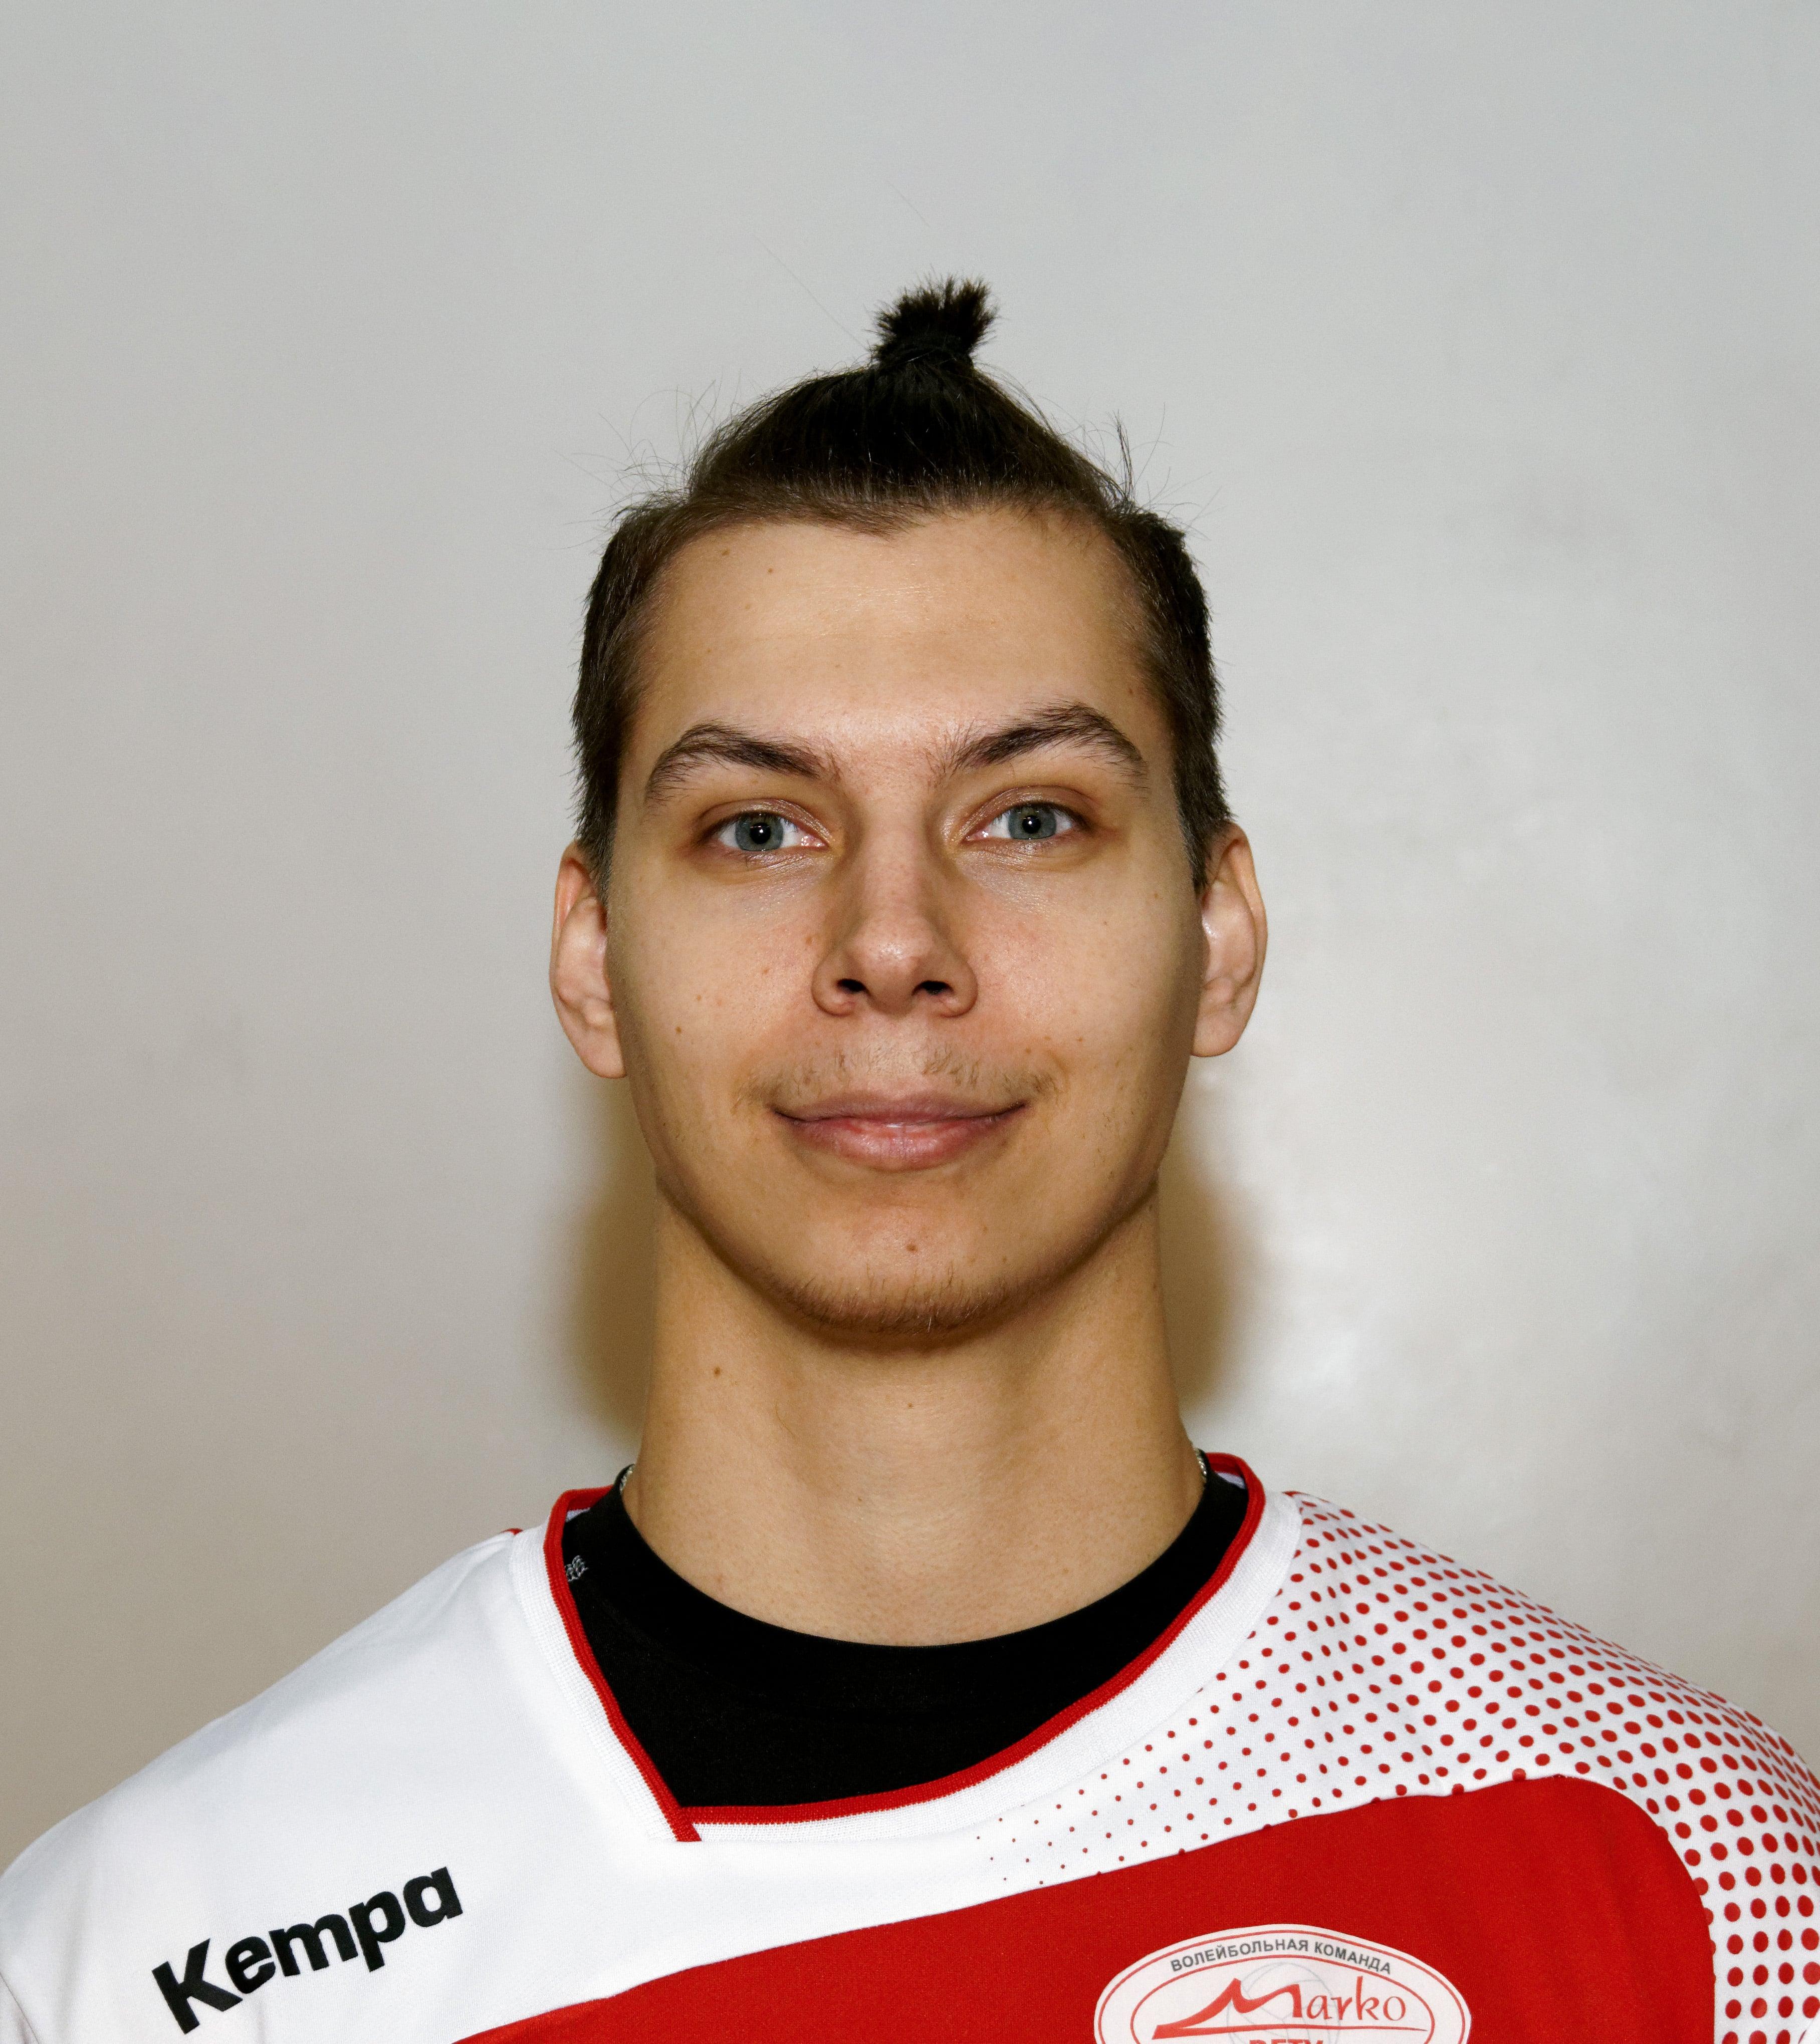 Марко-ВГТУ Сингаевский Антон